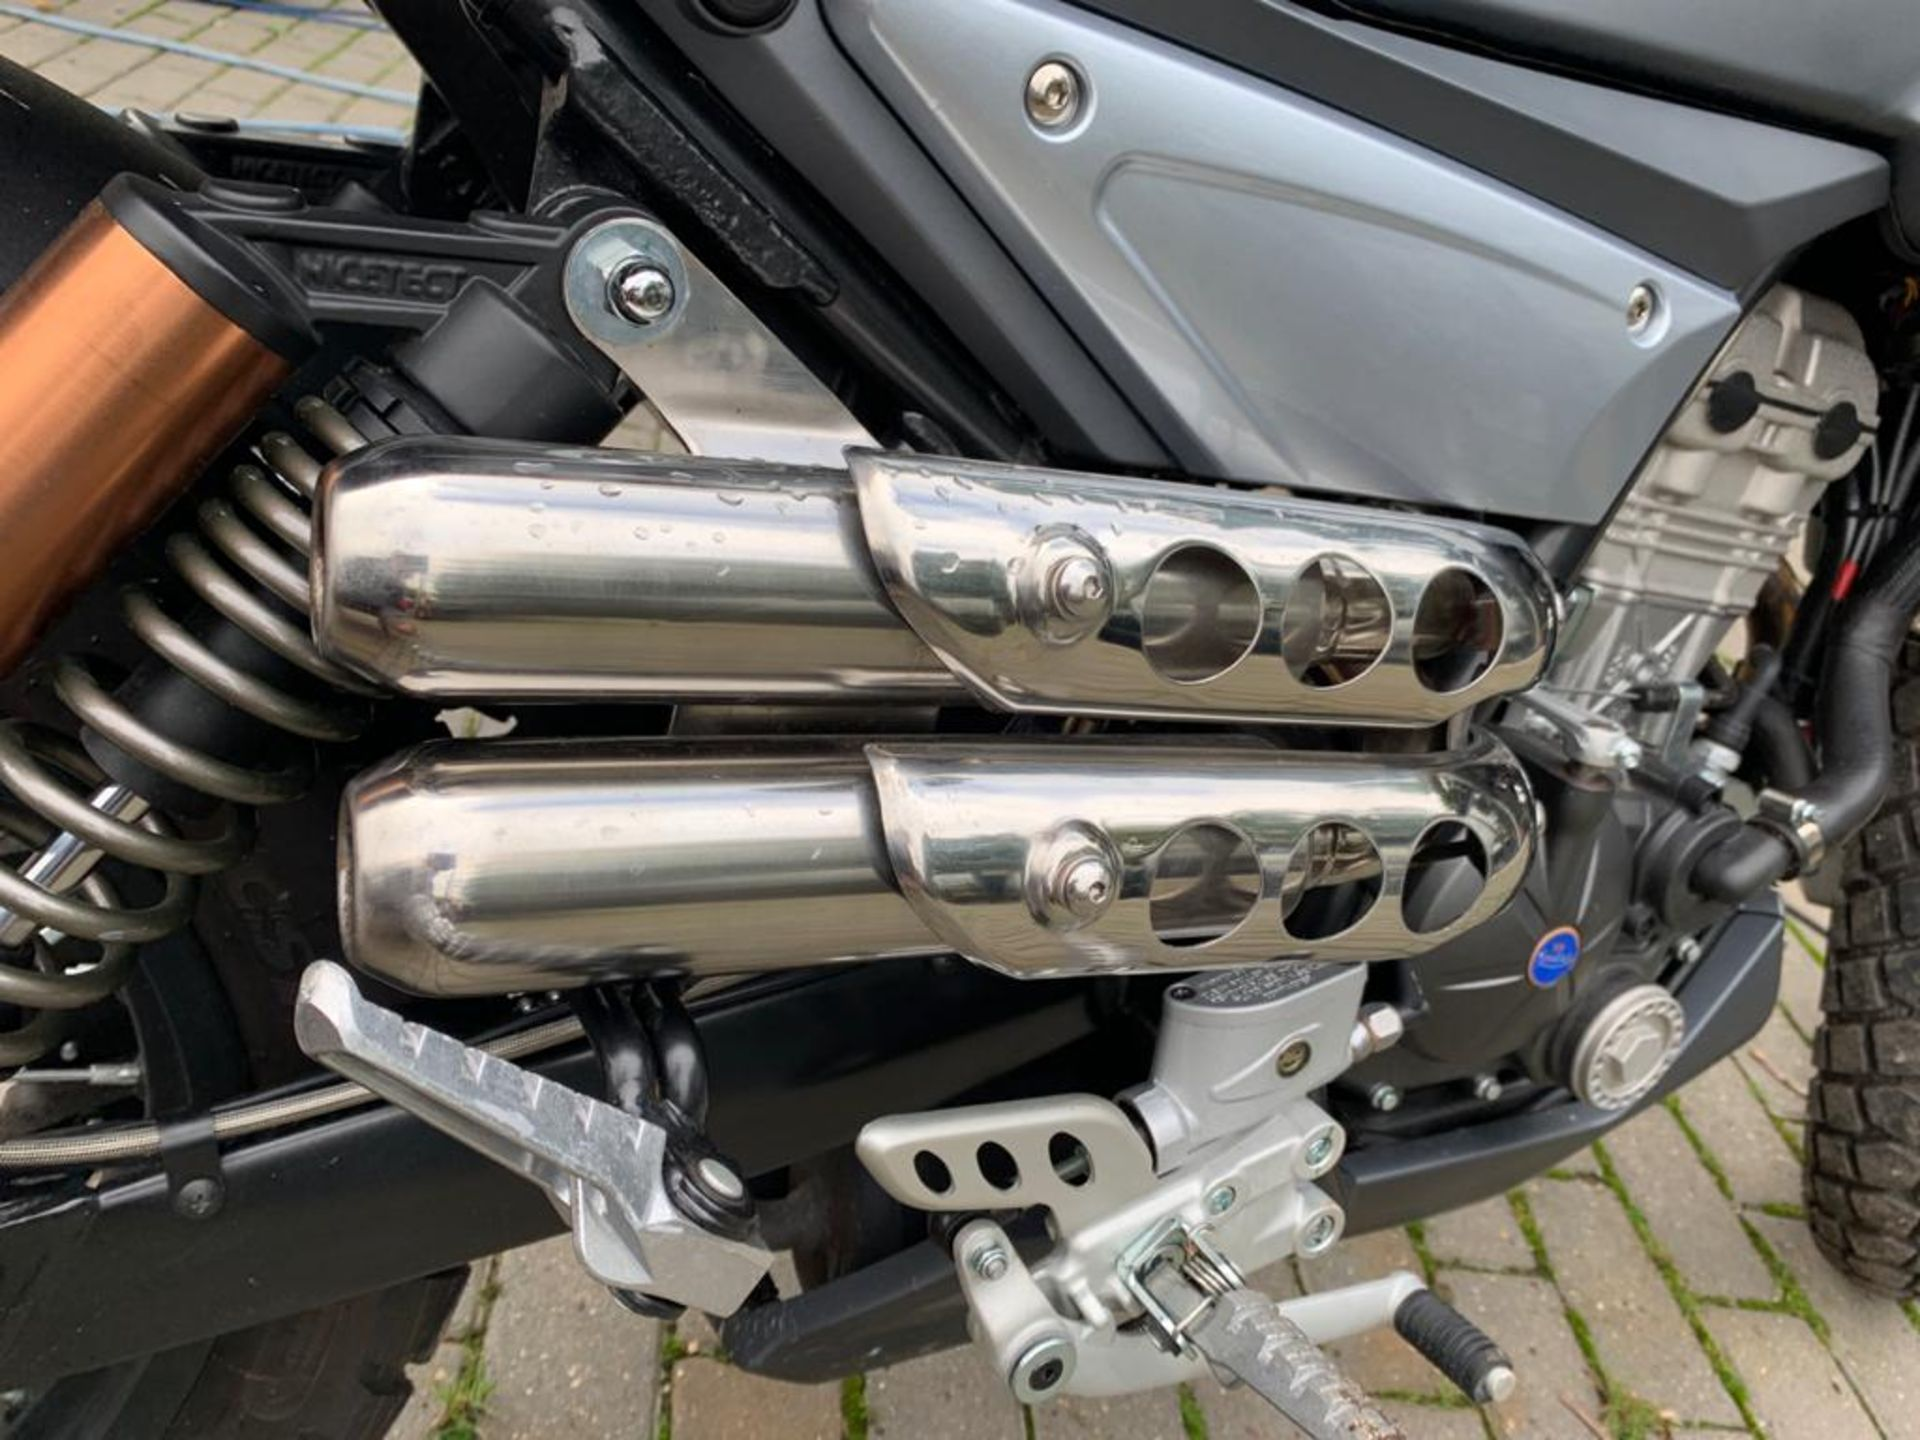 2018/18 REG MONDIAL HPS 125 S E4 SCRAMBLER MOTORBIKE / MOTORCYCLE, ROAD REGISTERED WITH V5 PRESENT - Image 7 of 11